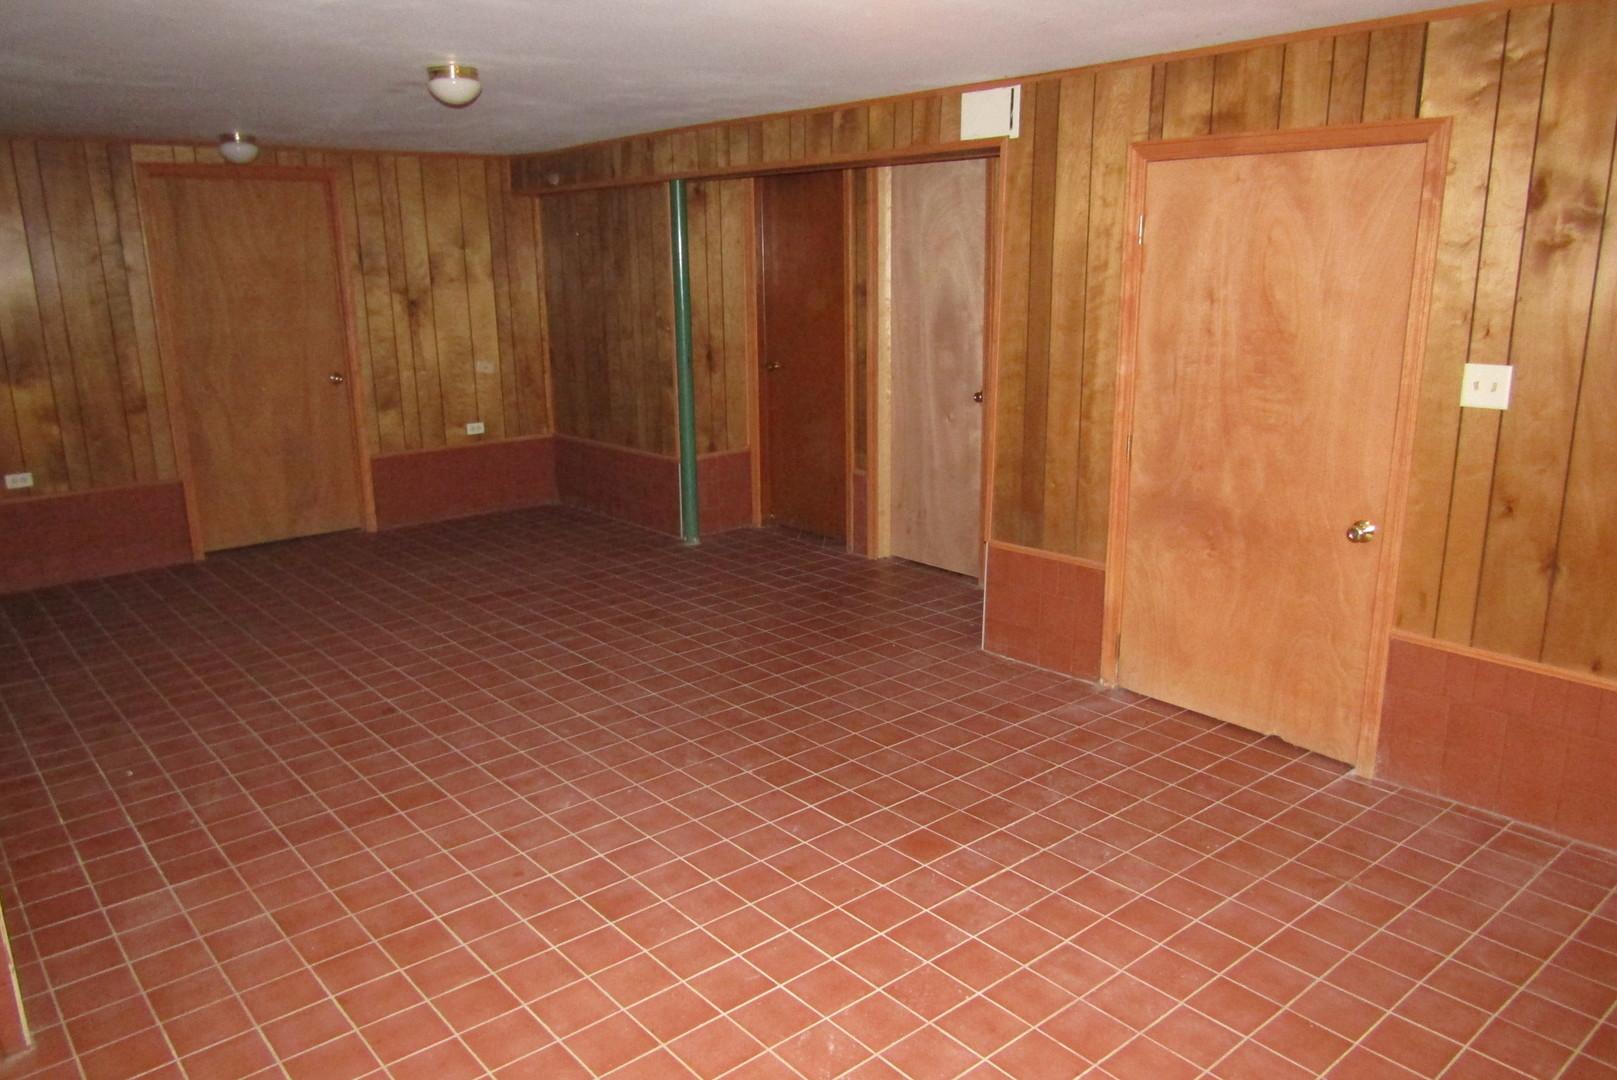 355 Ash, Wood Dale, Illinois, 60191